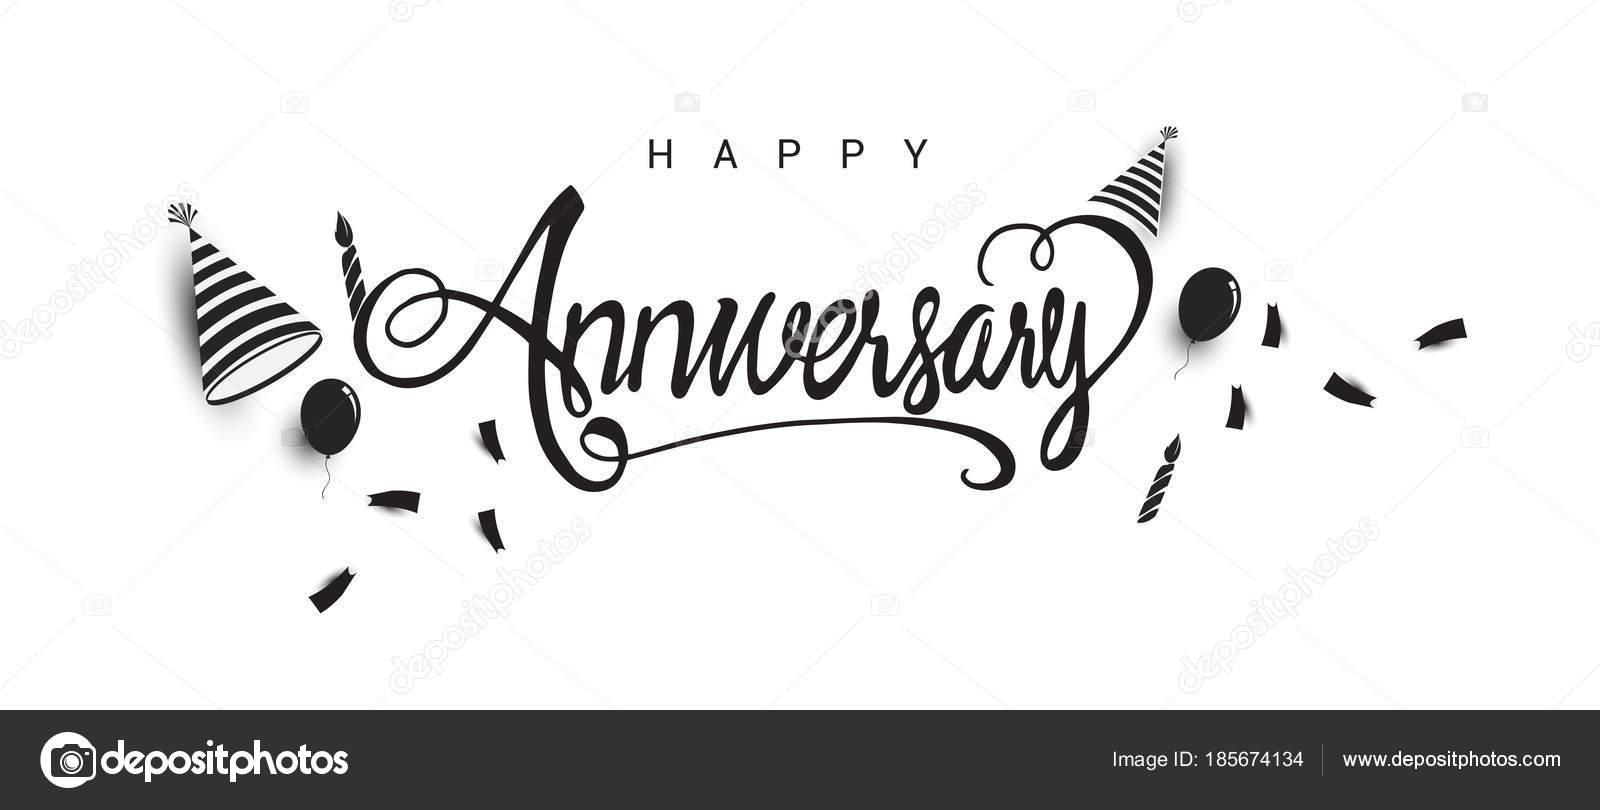 Banner Feliz Aniversario: Happy Anniversary Lettering Text Banner Holiday Balloons